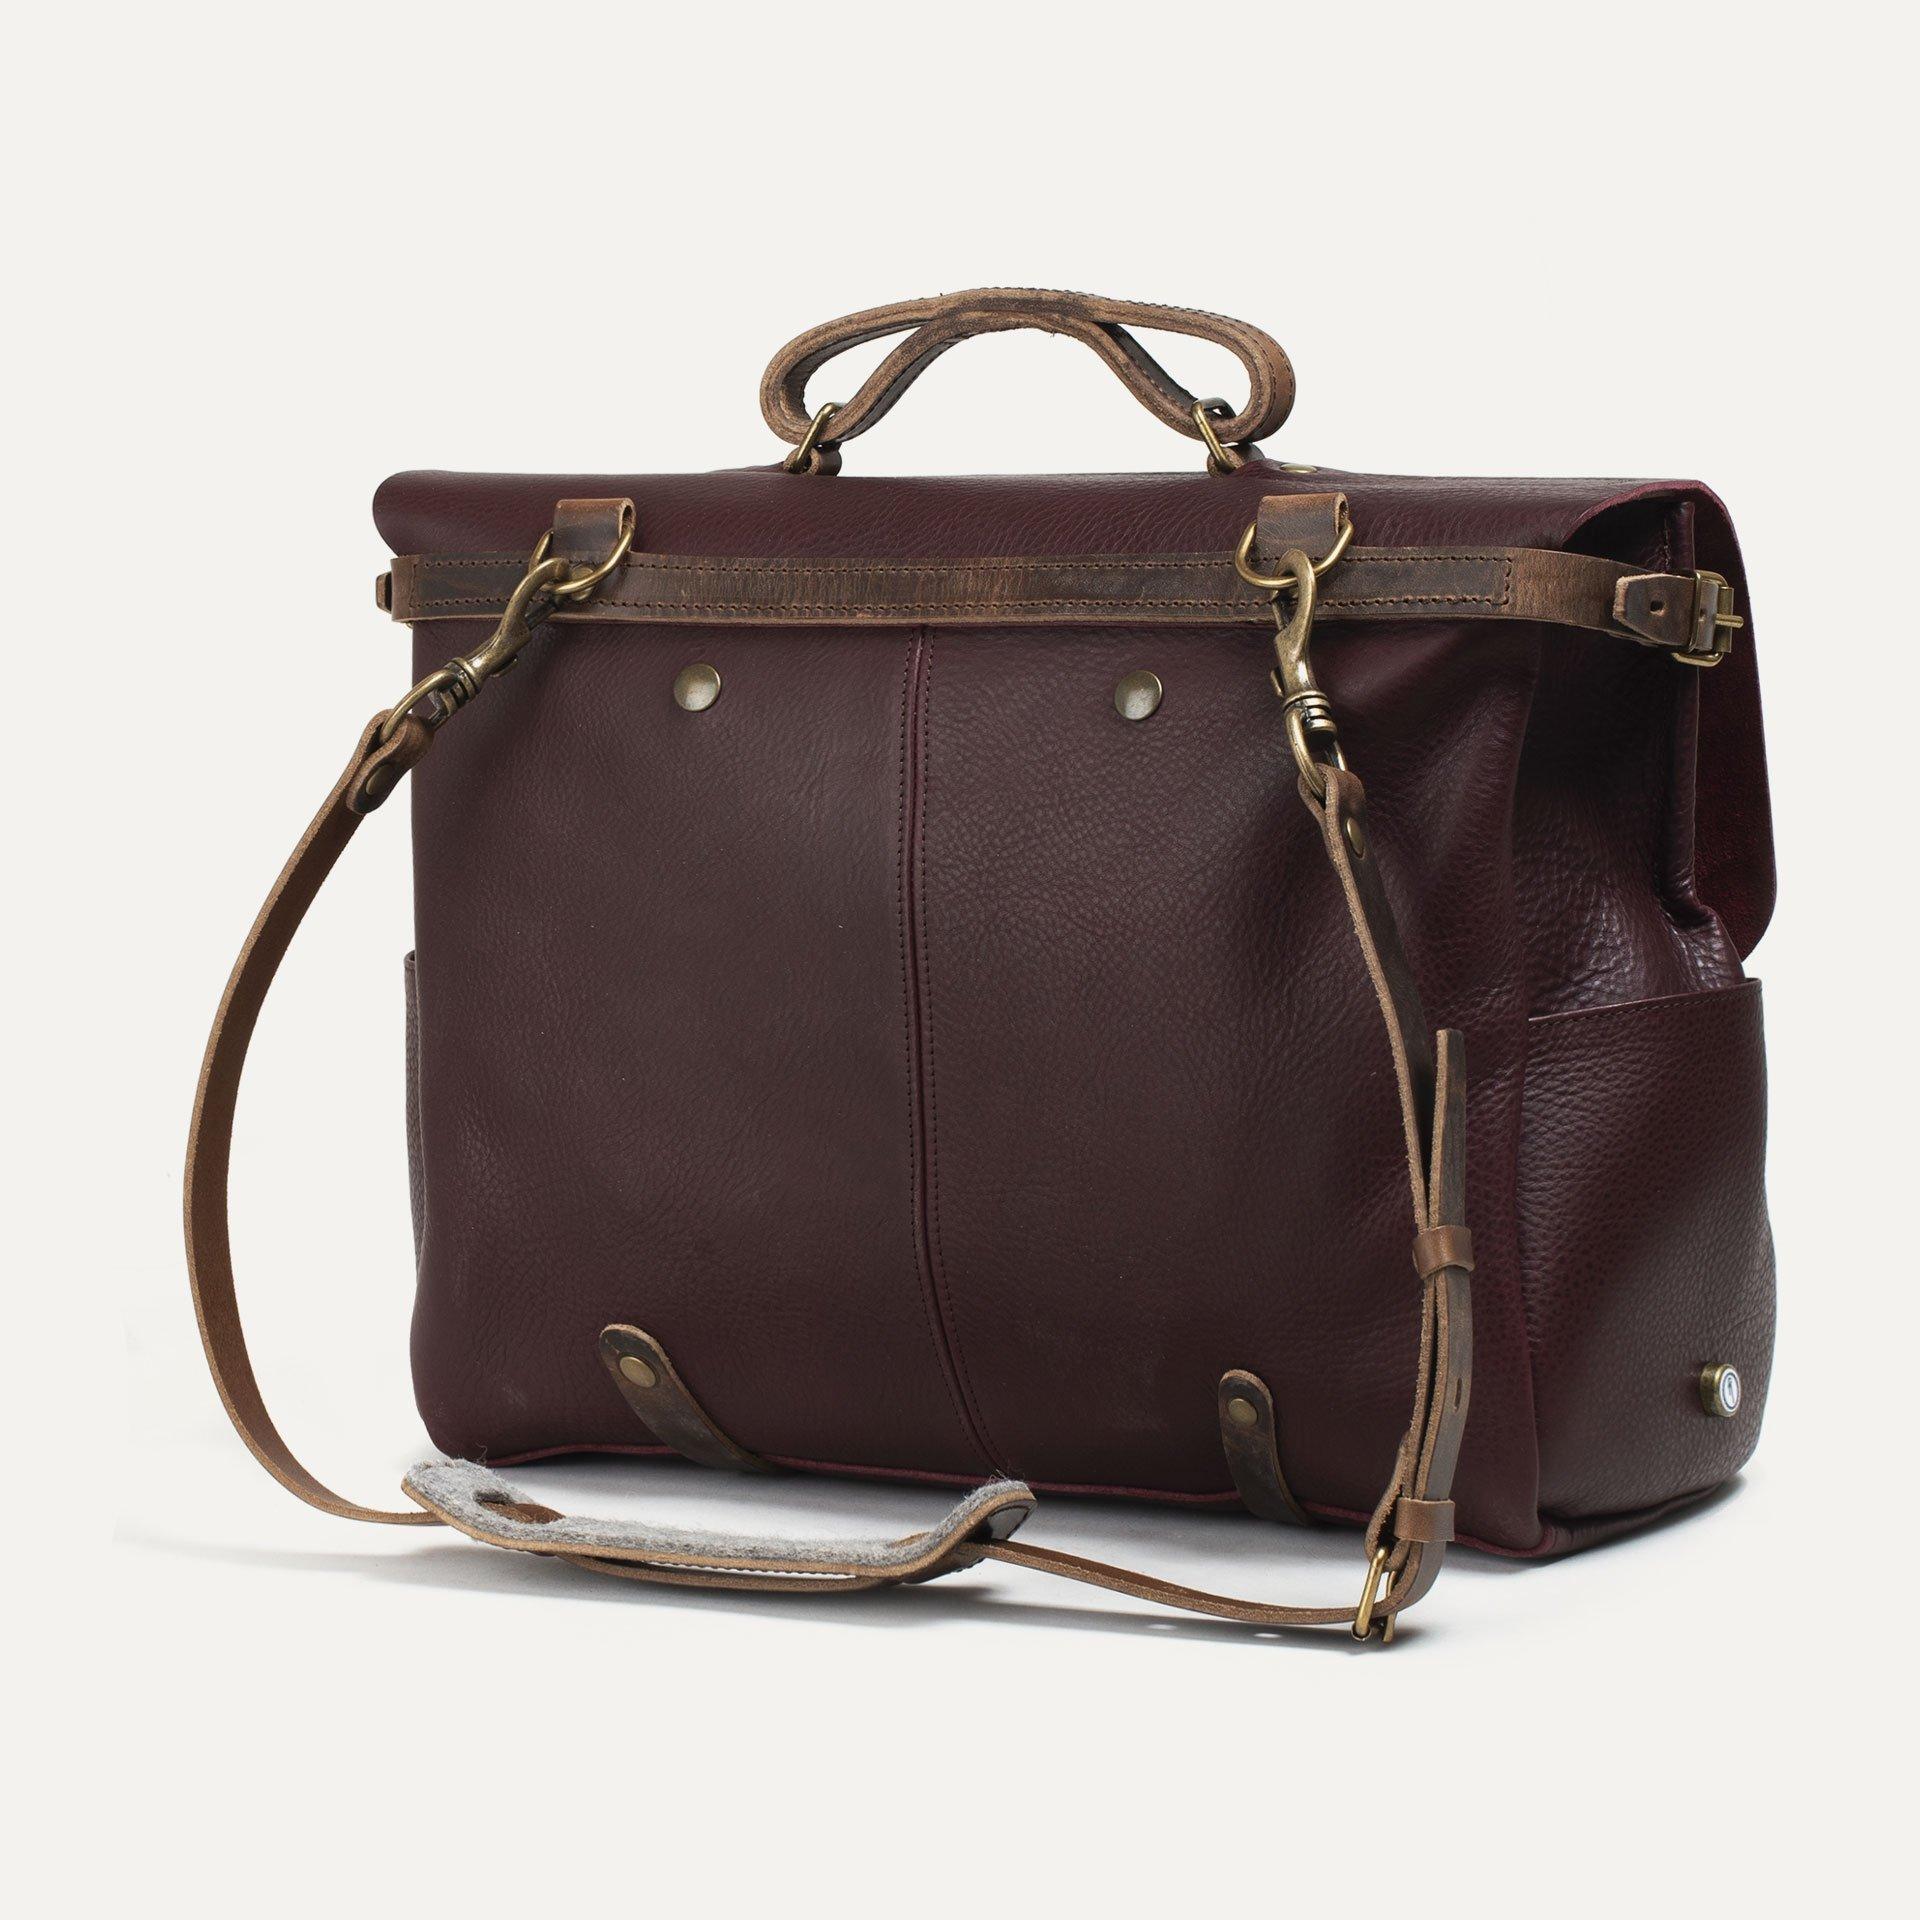 48h Irving Executive Postman bag - Peat (image n°3)